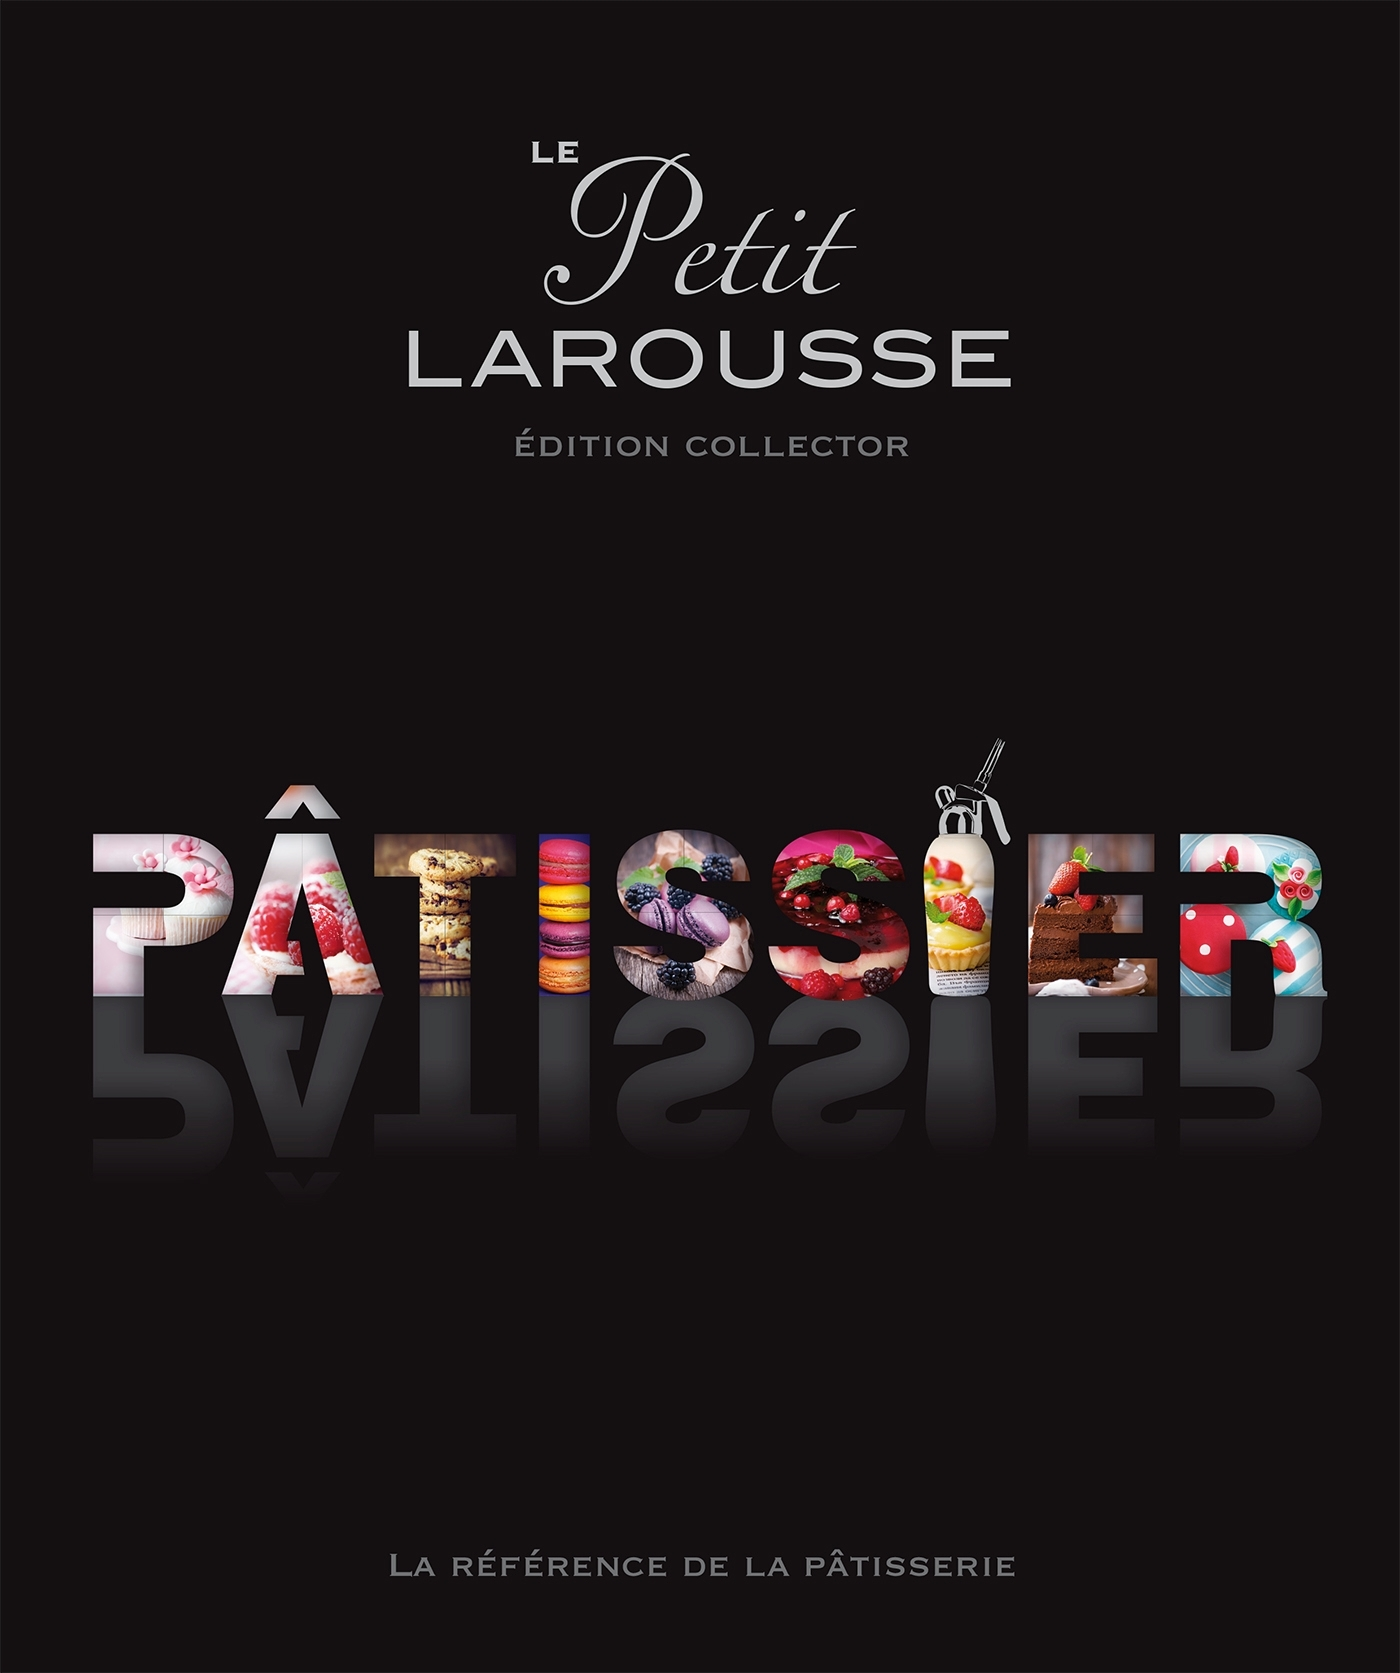 PETIT LAROUSSE ILLUSTRE PATISSIER (SERIE LIMITEE)